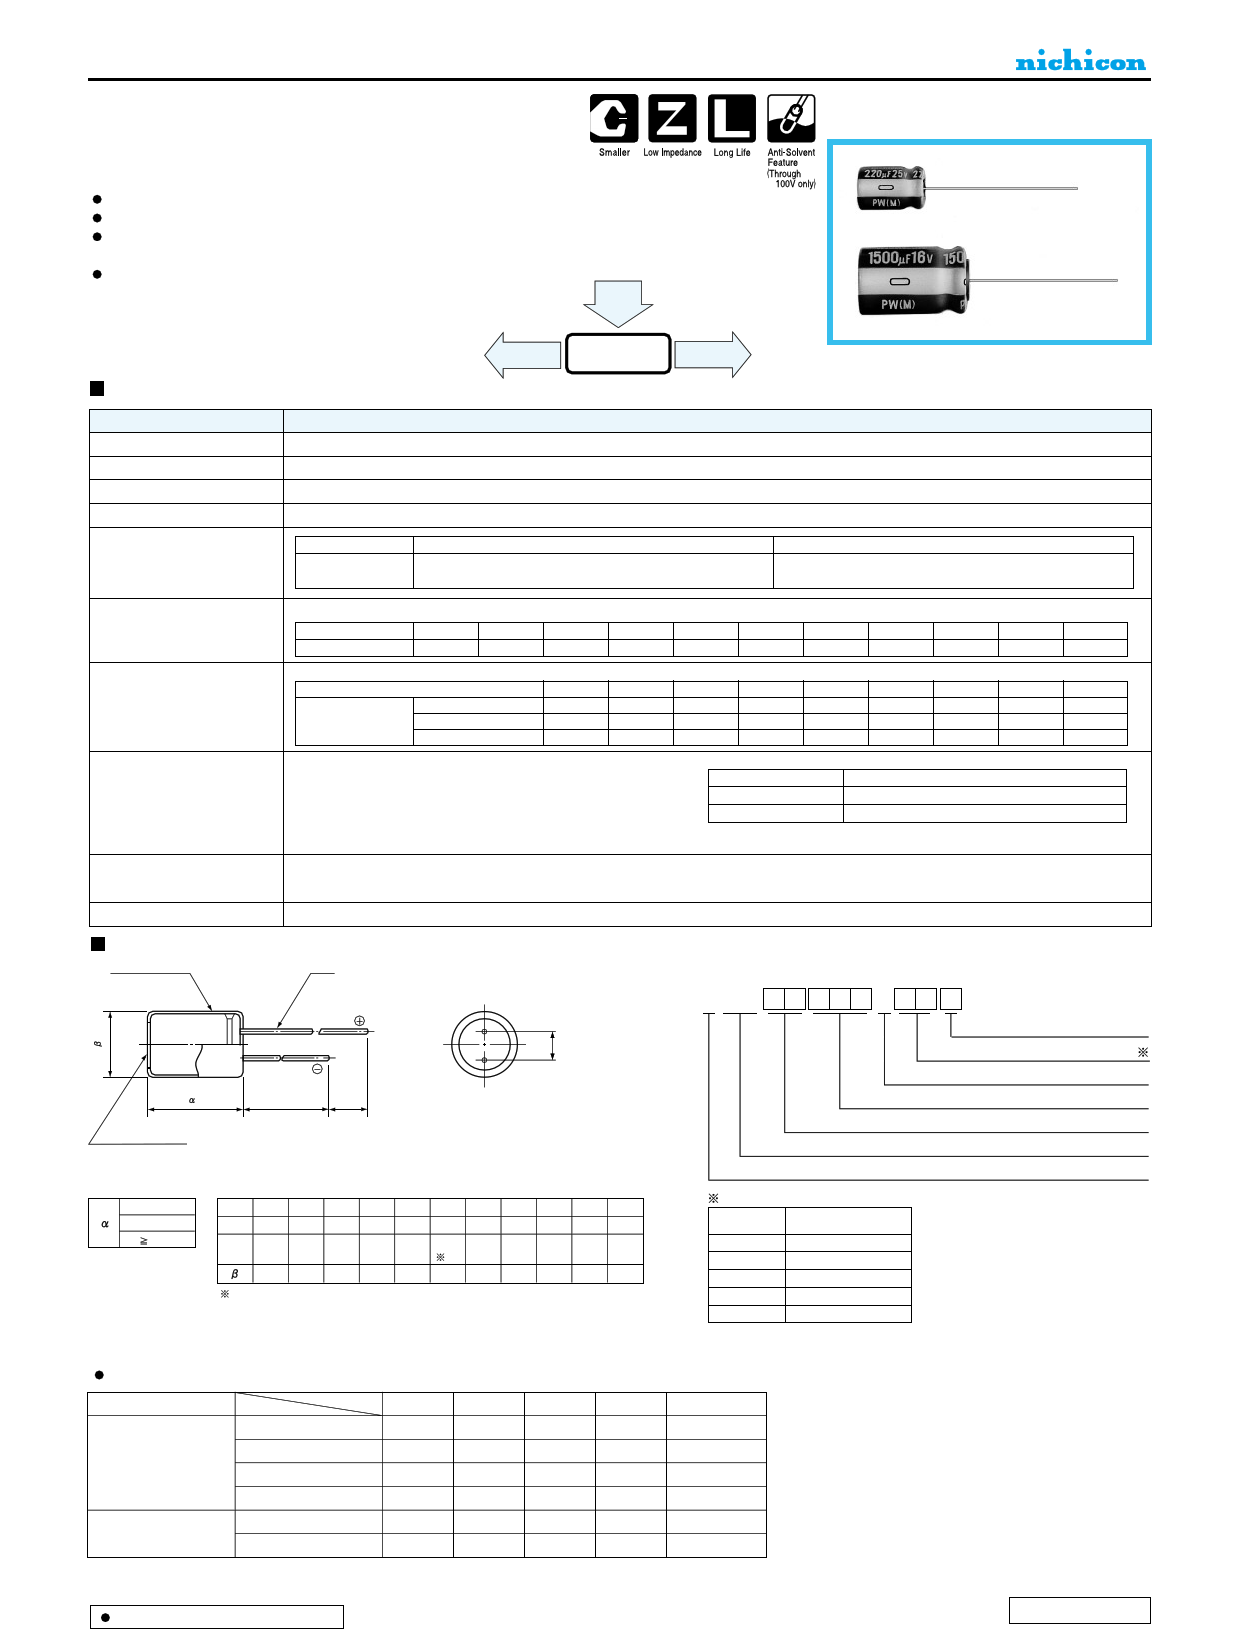 UPW1C681MPD 데이터시트 및 UPW1C681MPD PDF